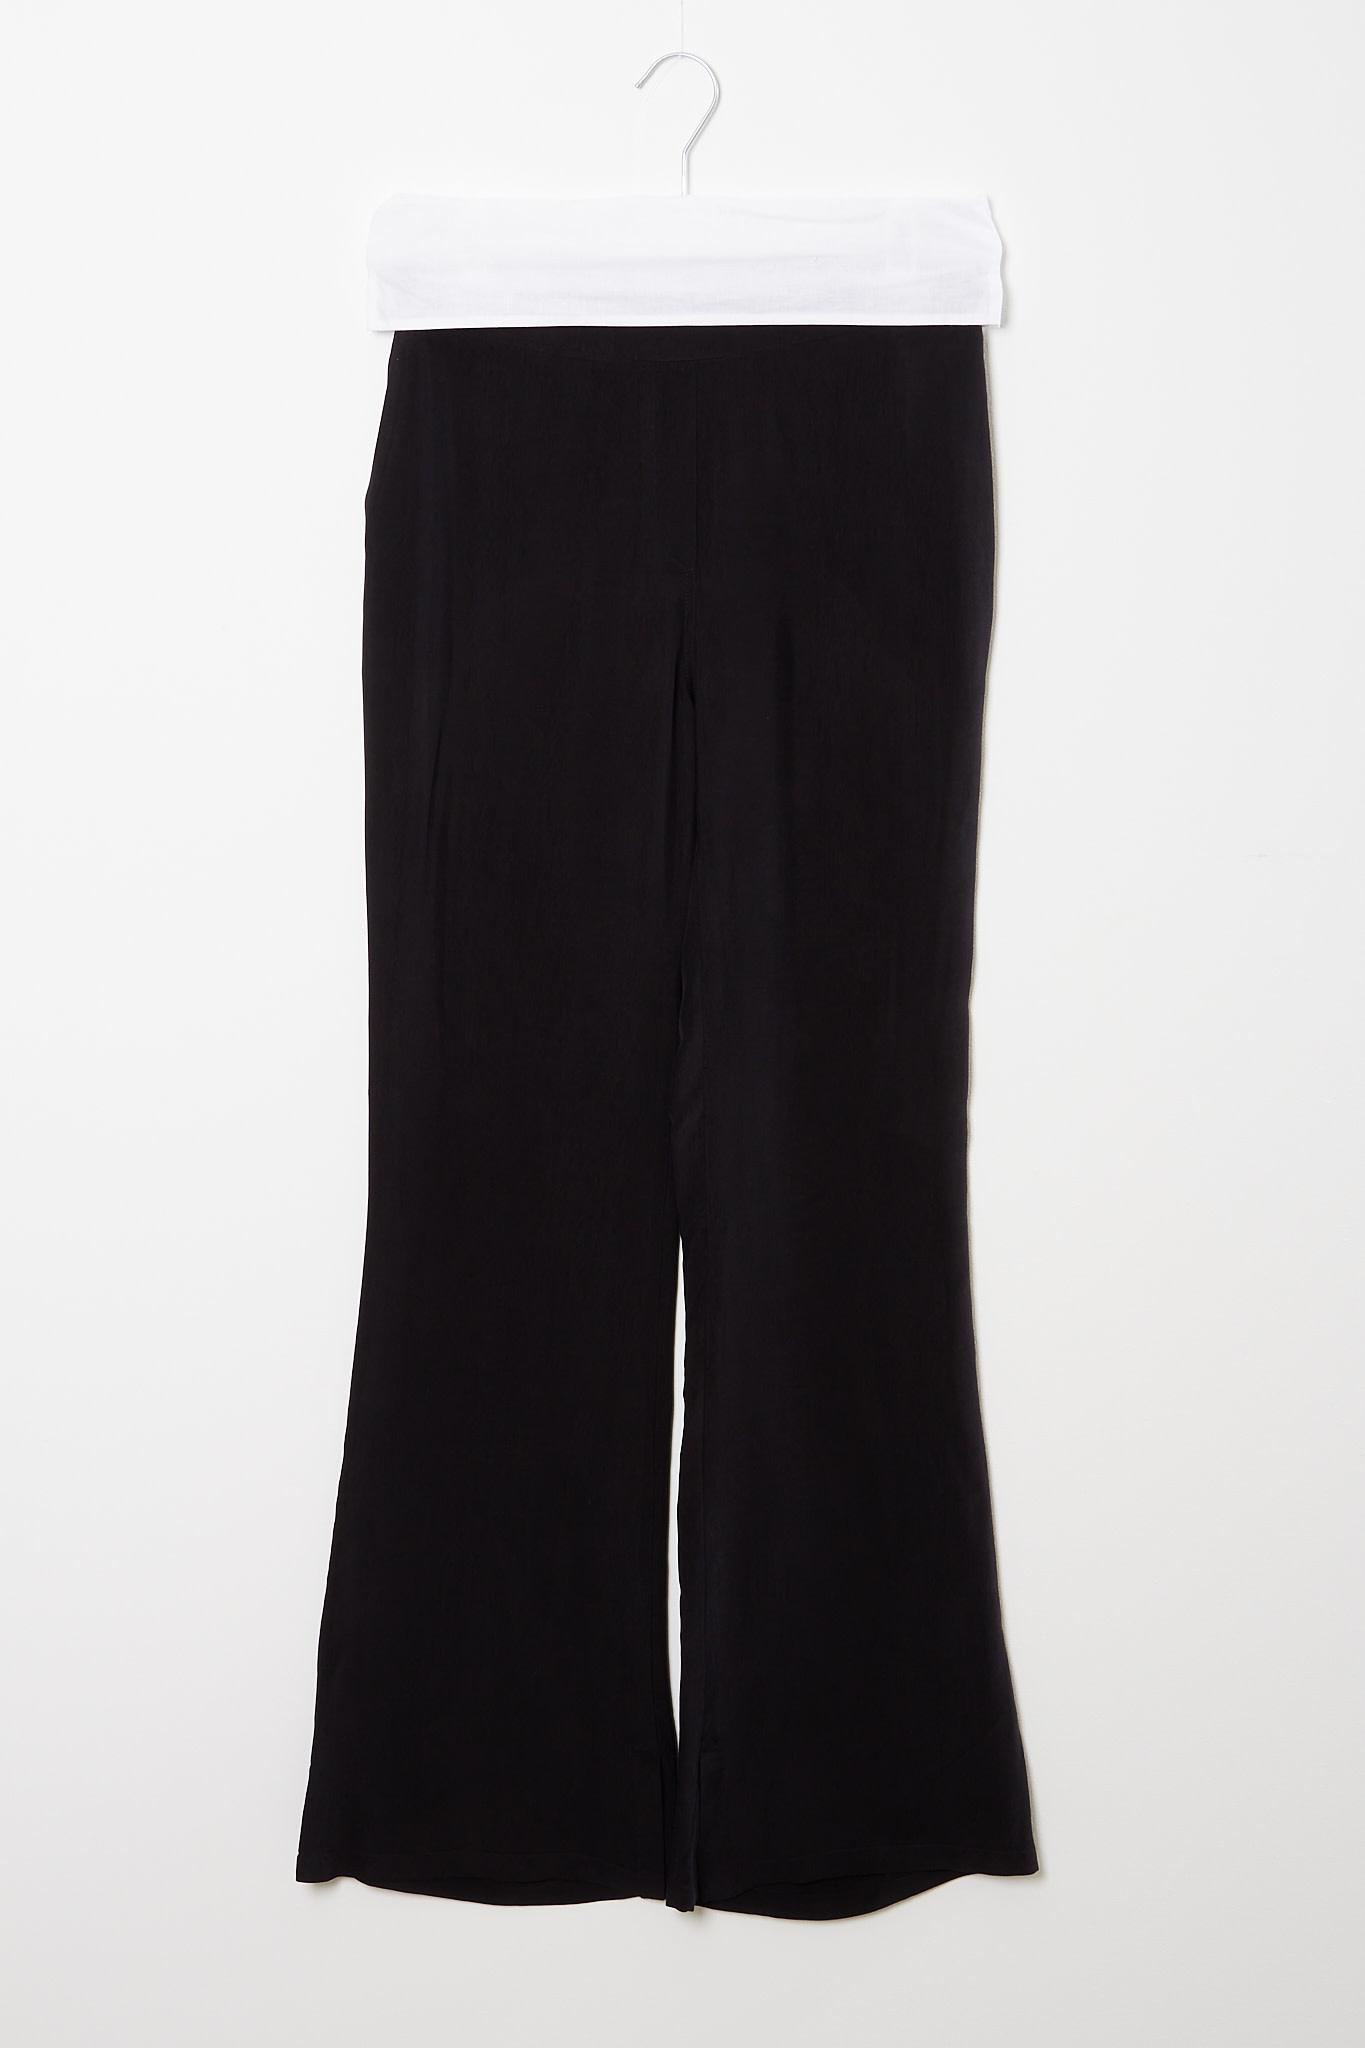 Humanoid - Roya root trousers